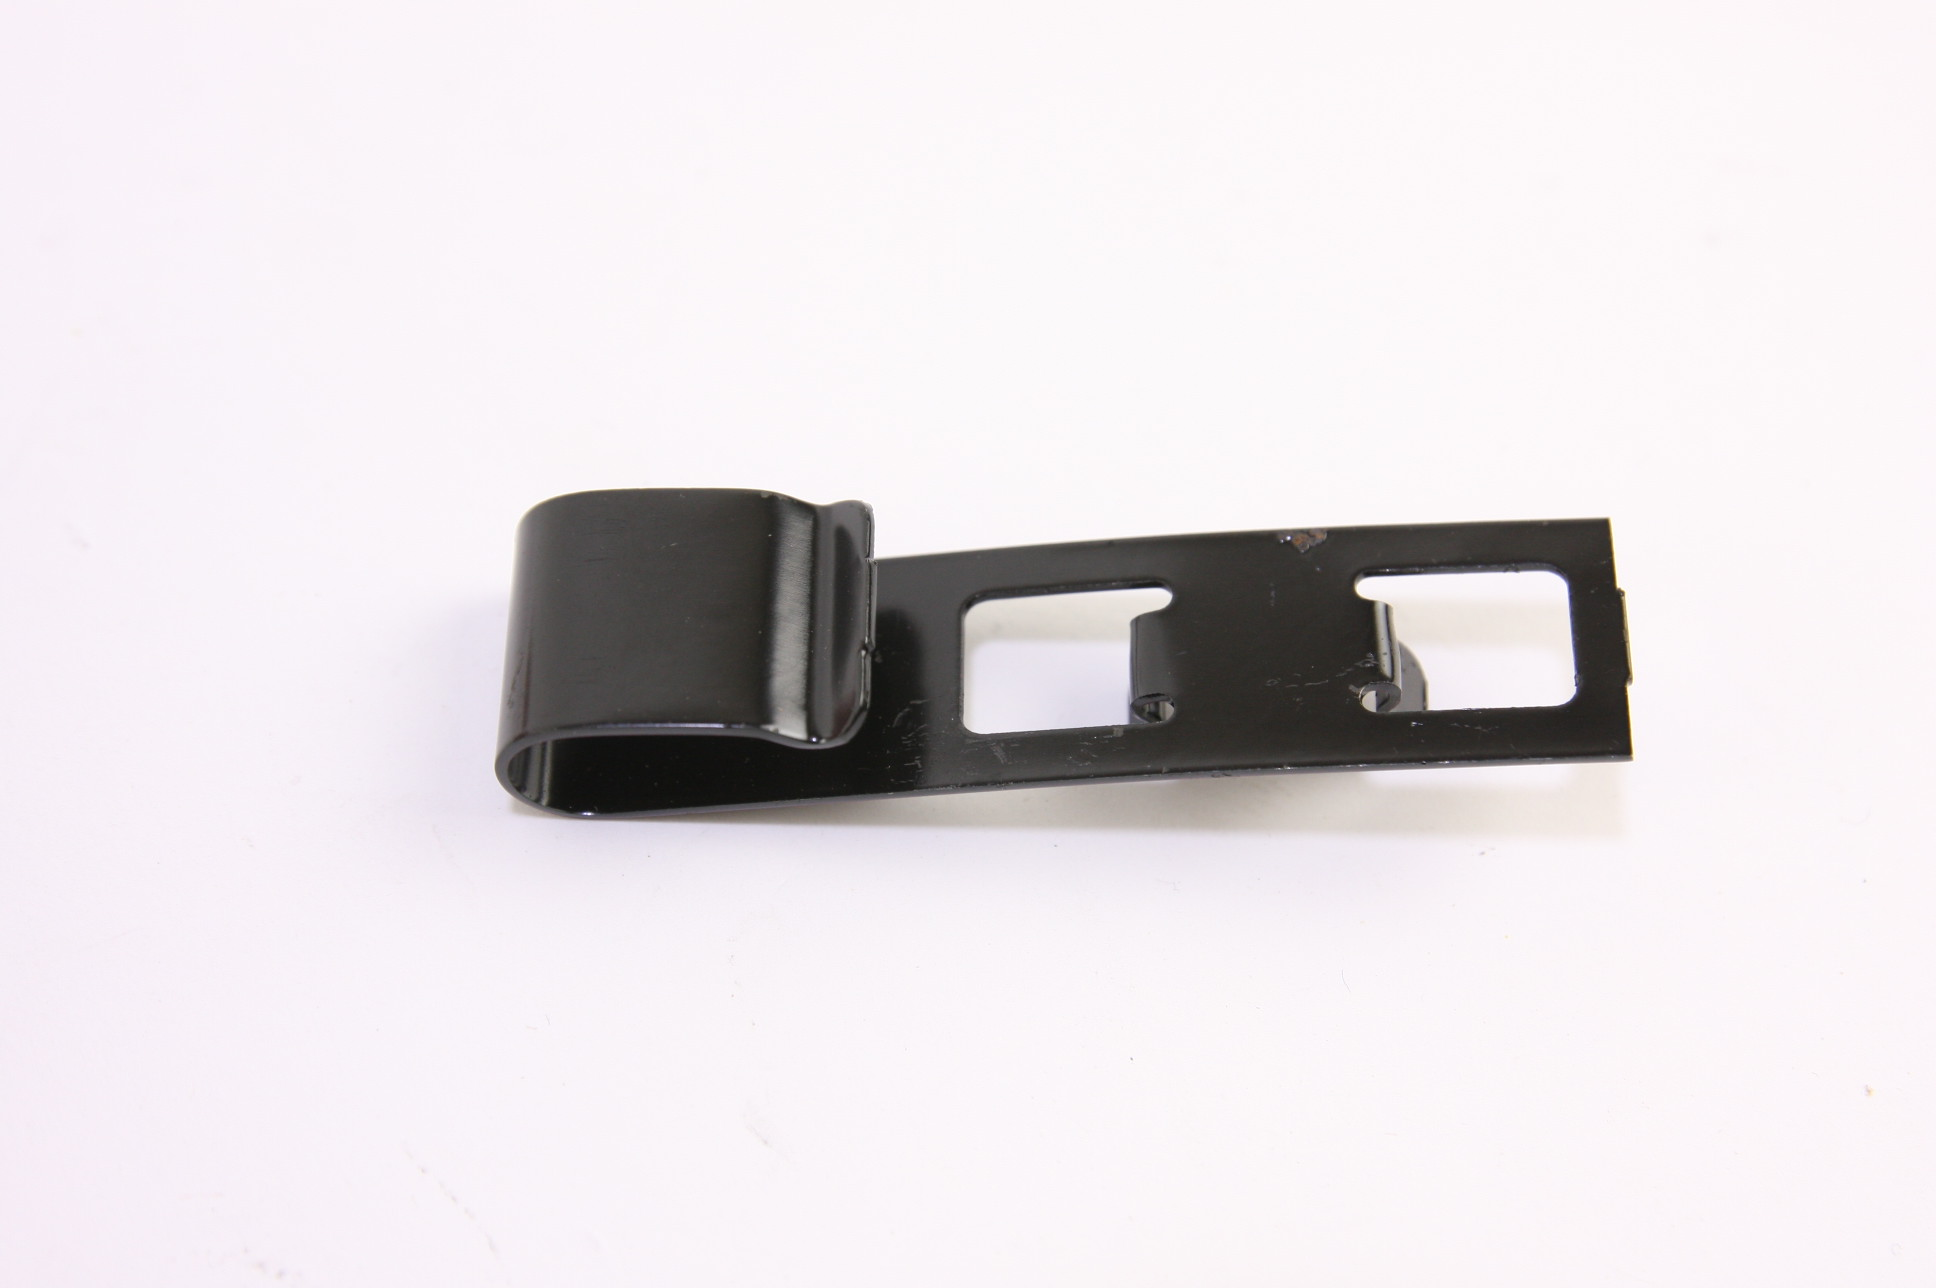 **** New OEM F81Z7N291FC Genuine OEM Ford Return Pipe Clip Fast Free Shipping - image 6